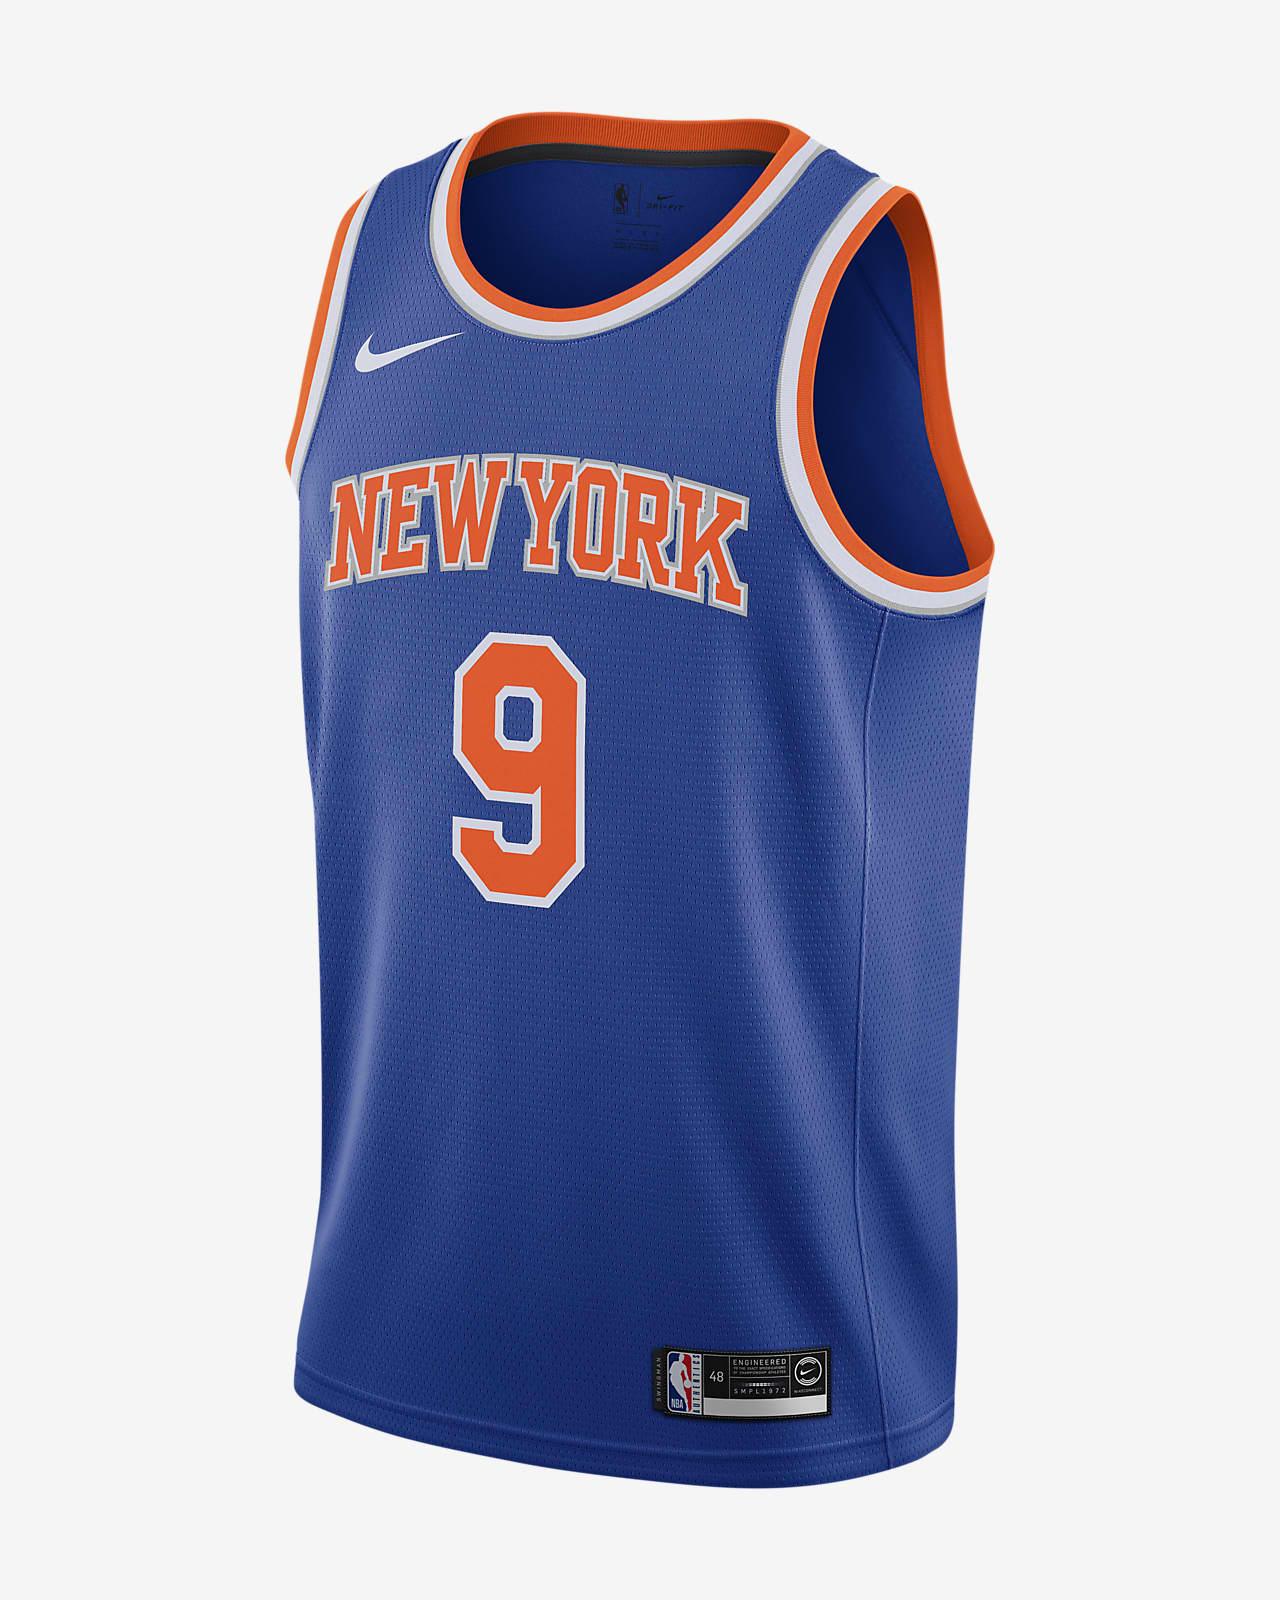 Camisola NBA da Nike Swingman RJ Barrett Knicks Icon Edition para homem